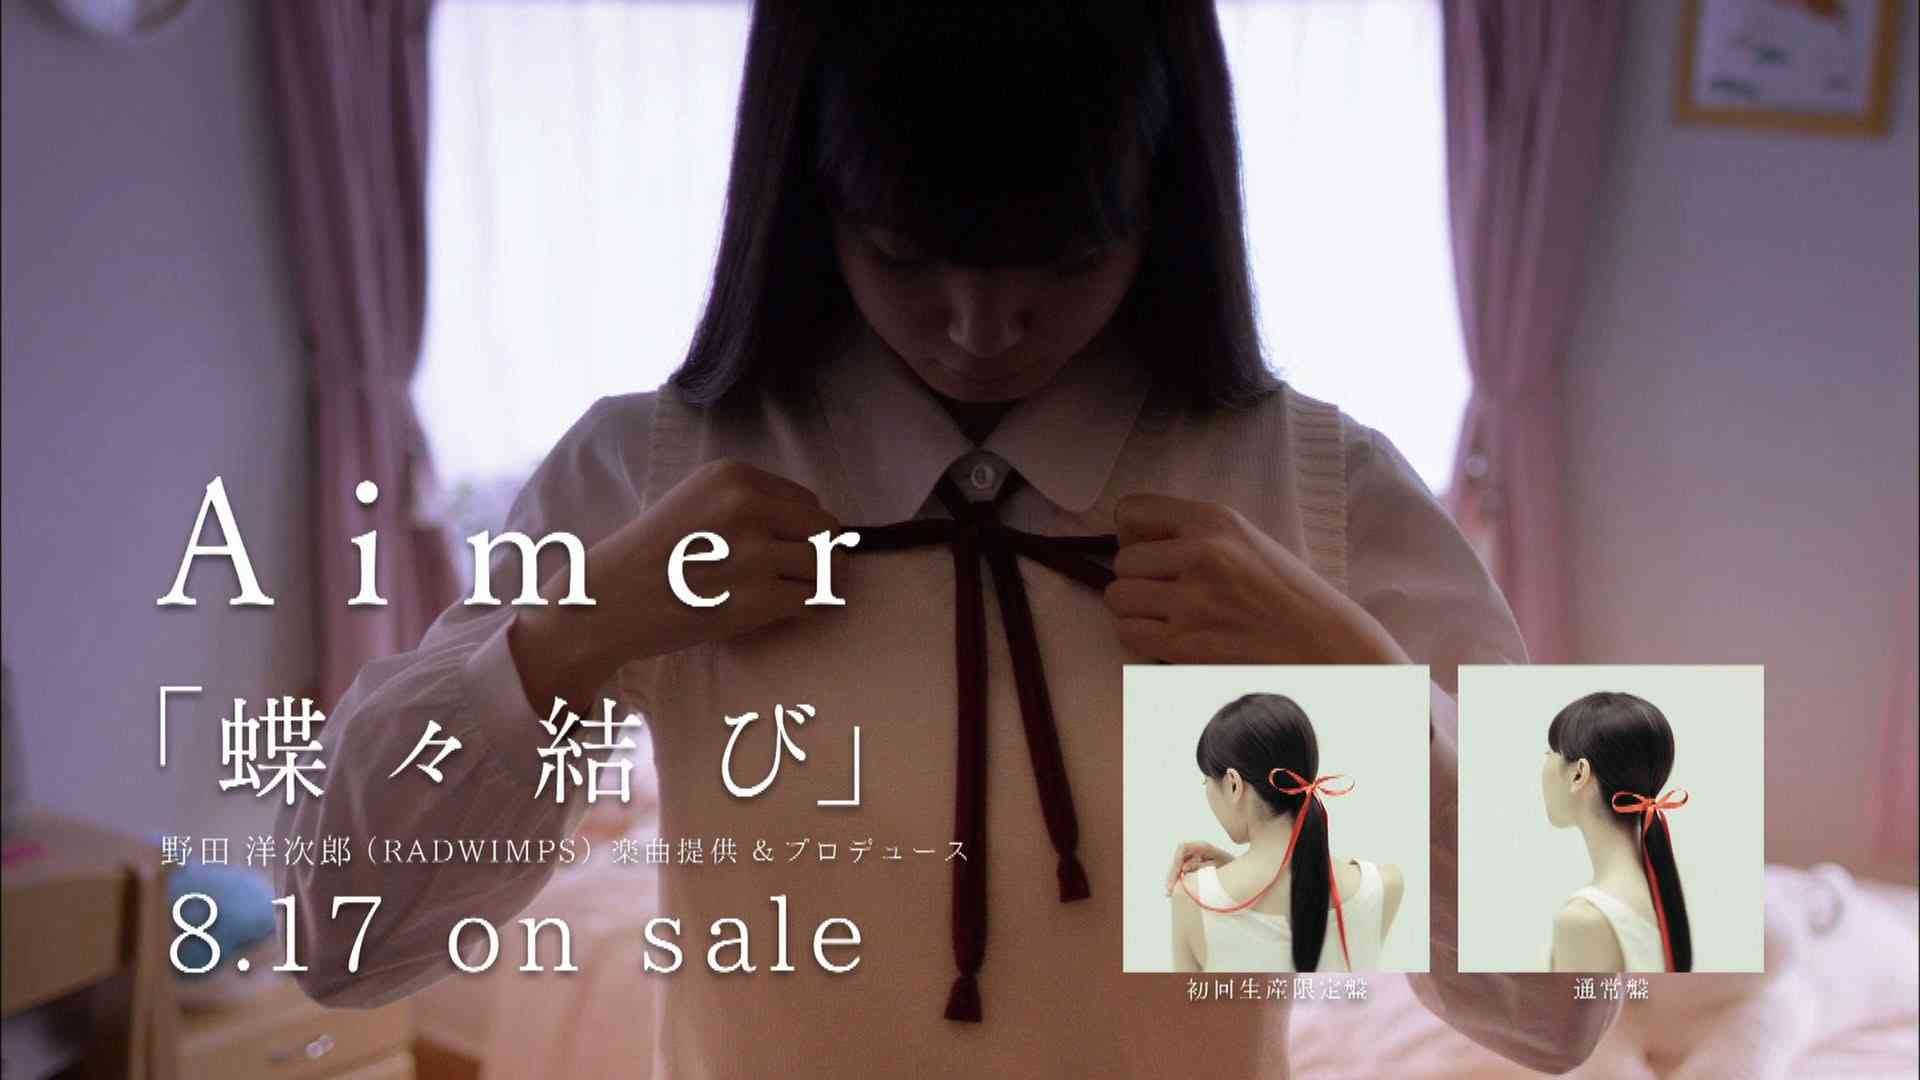 Aimer 『蝶々結び』 ※野田洋次郎(RADWIMPS)楽曲提供・プロデュース - YouTube